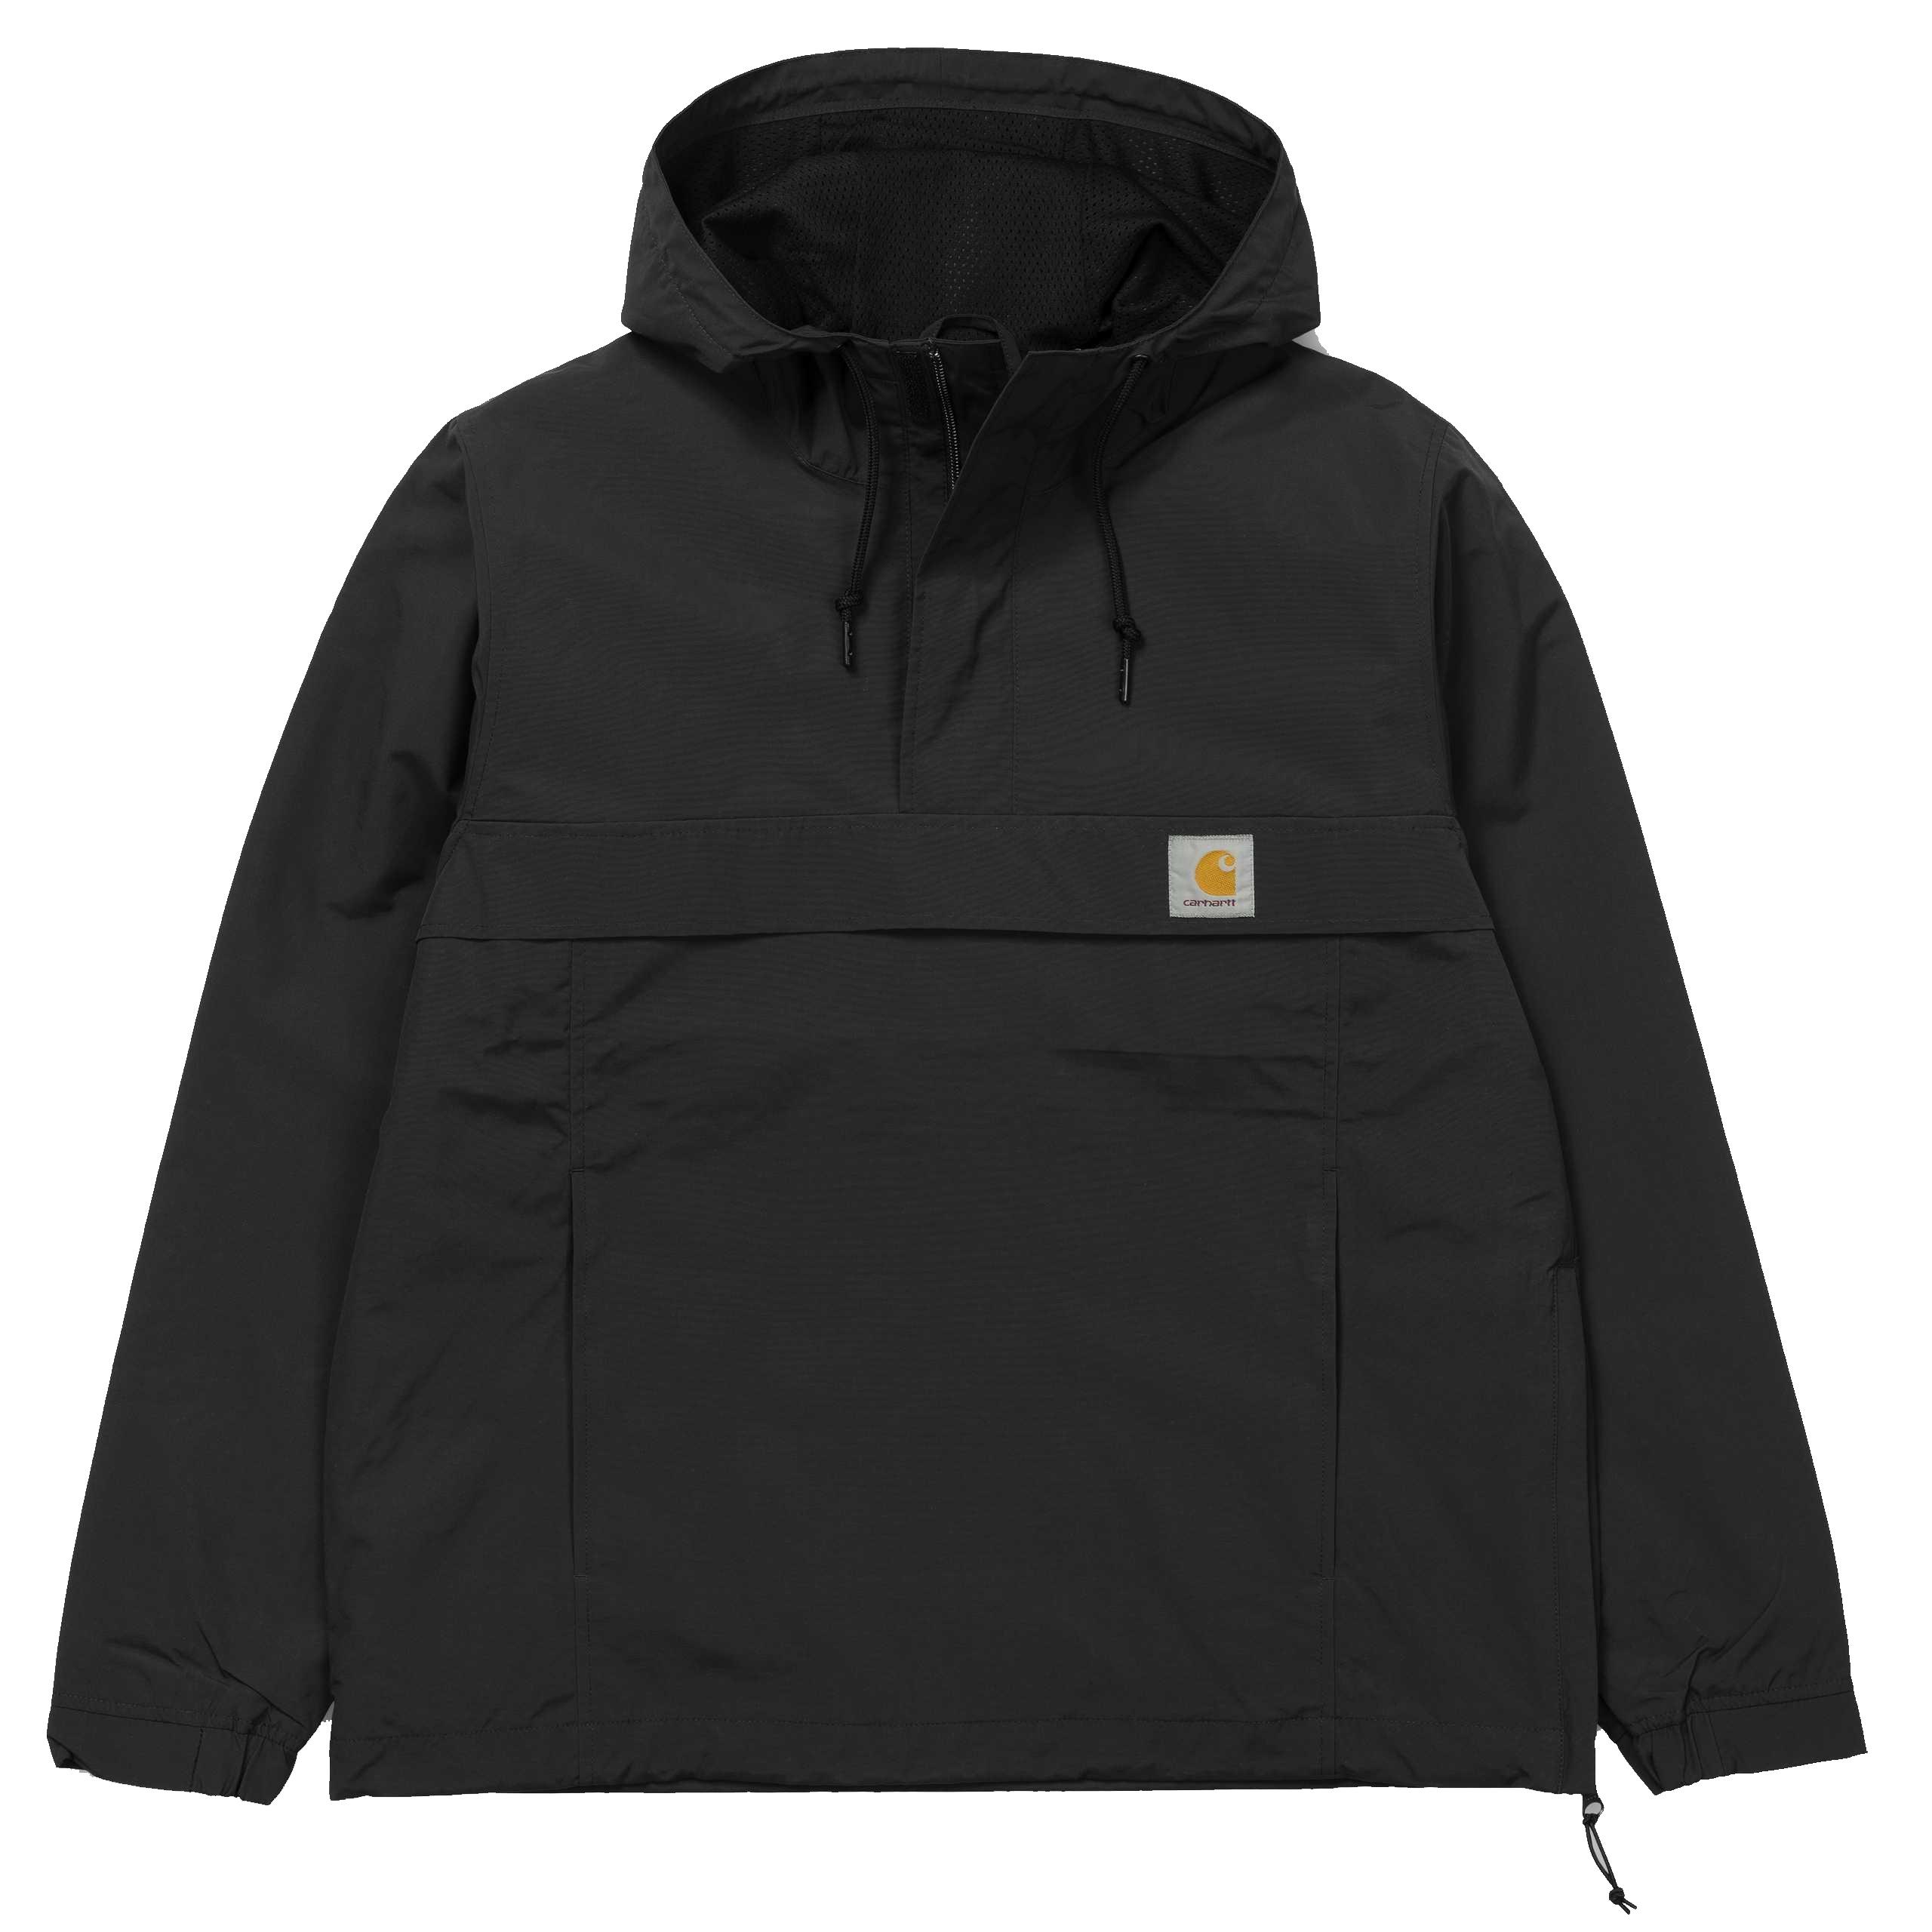 667058182b61 Carhartt   t-shirts, vestes, bonnets, toute la mode urbaine. - PRECISION SKI